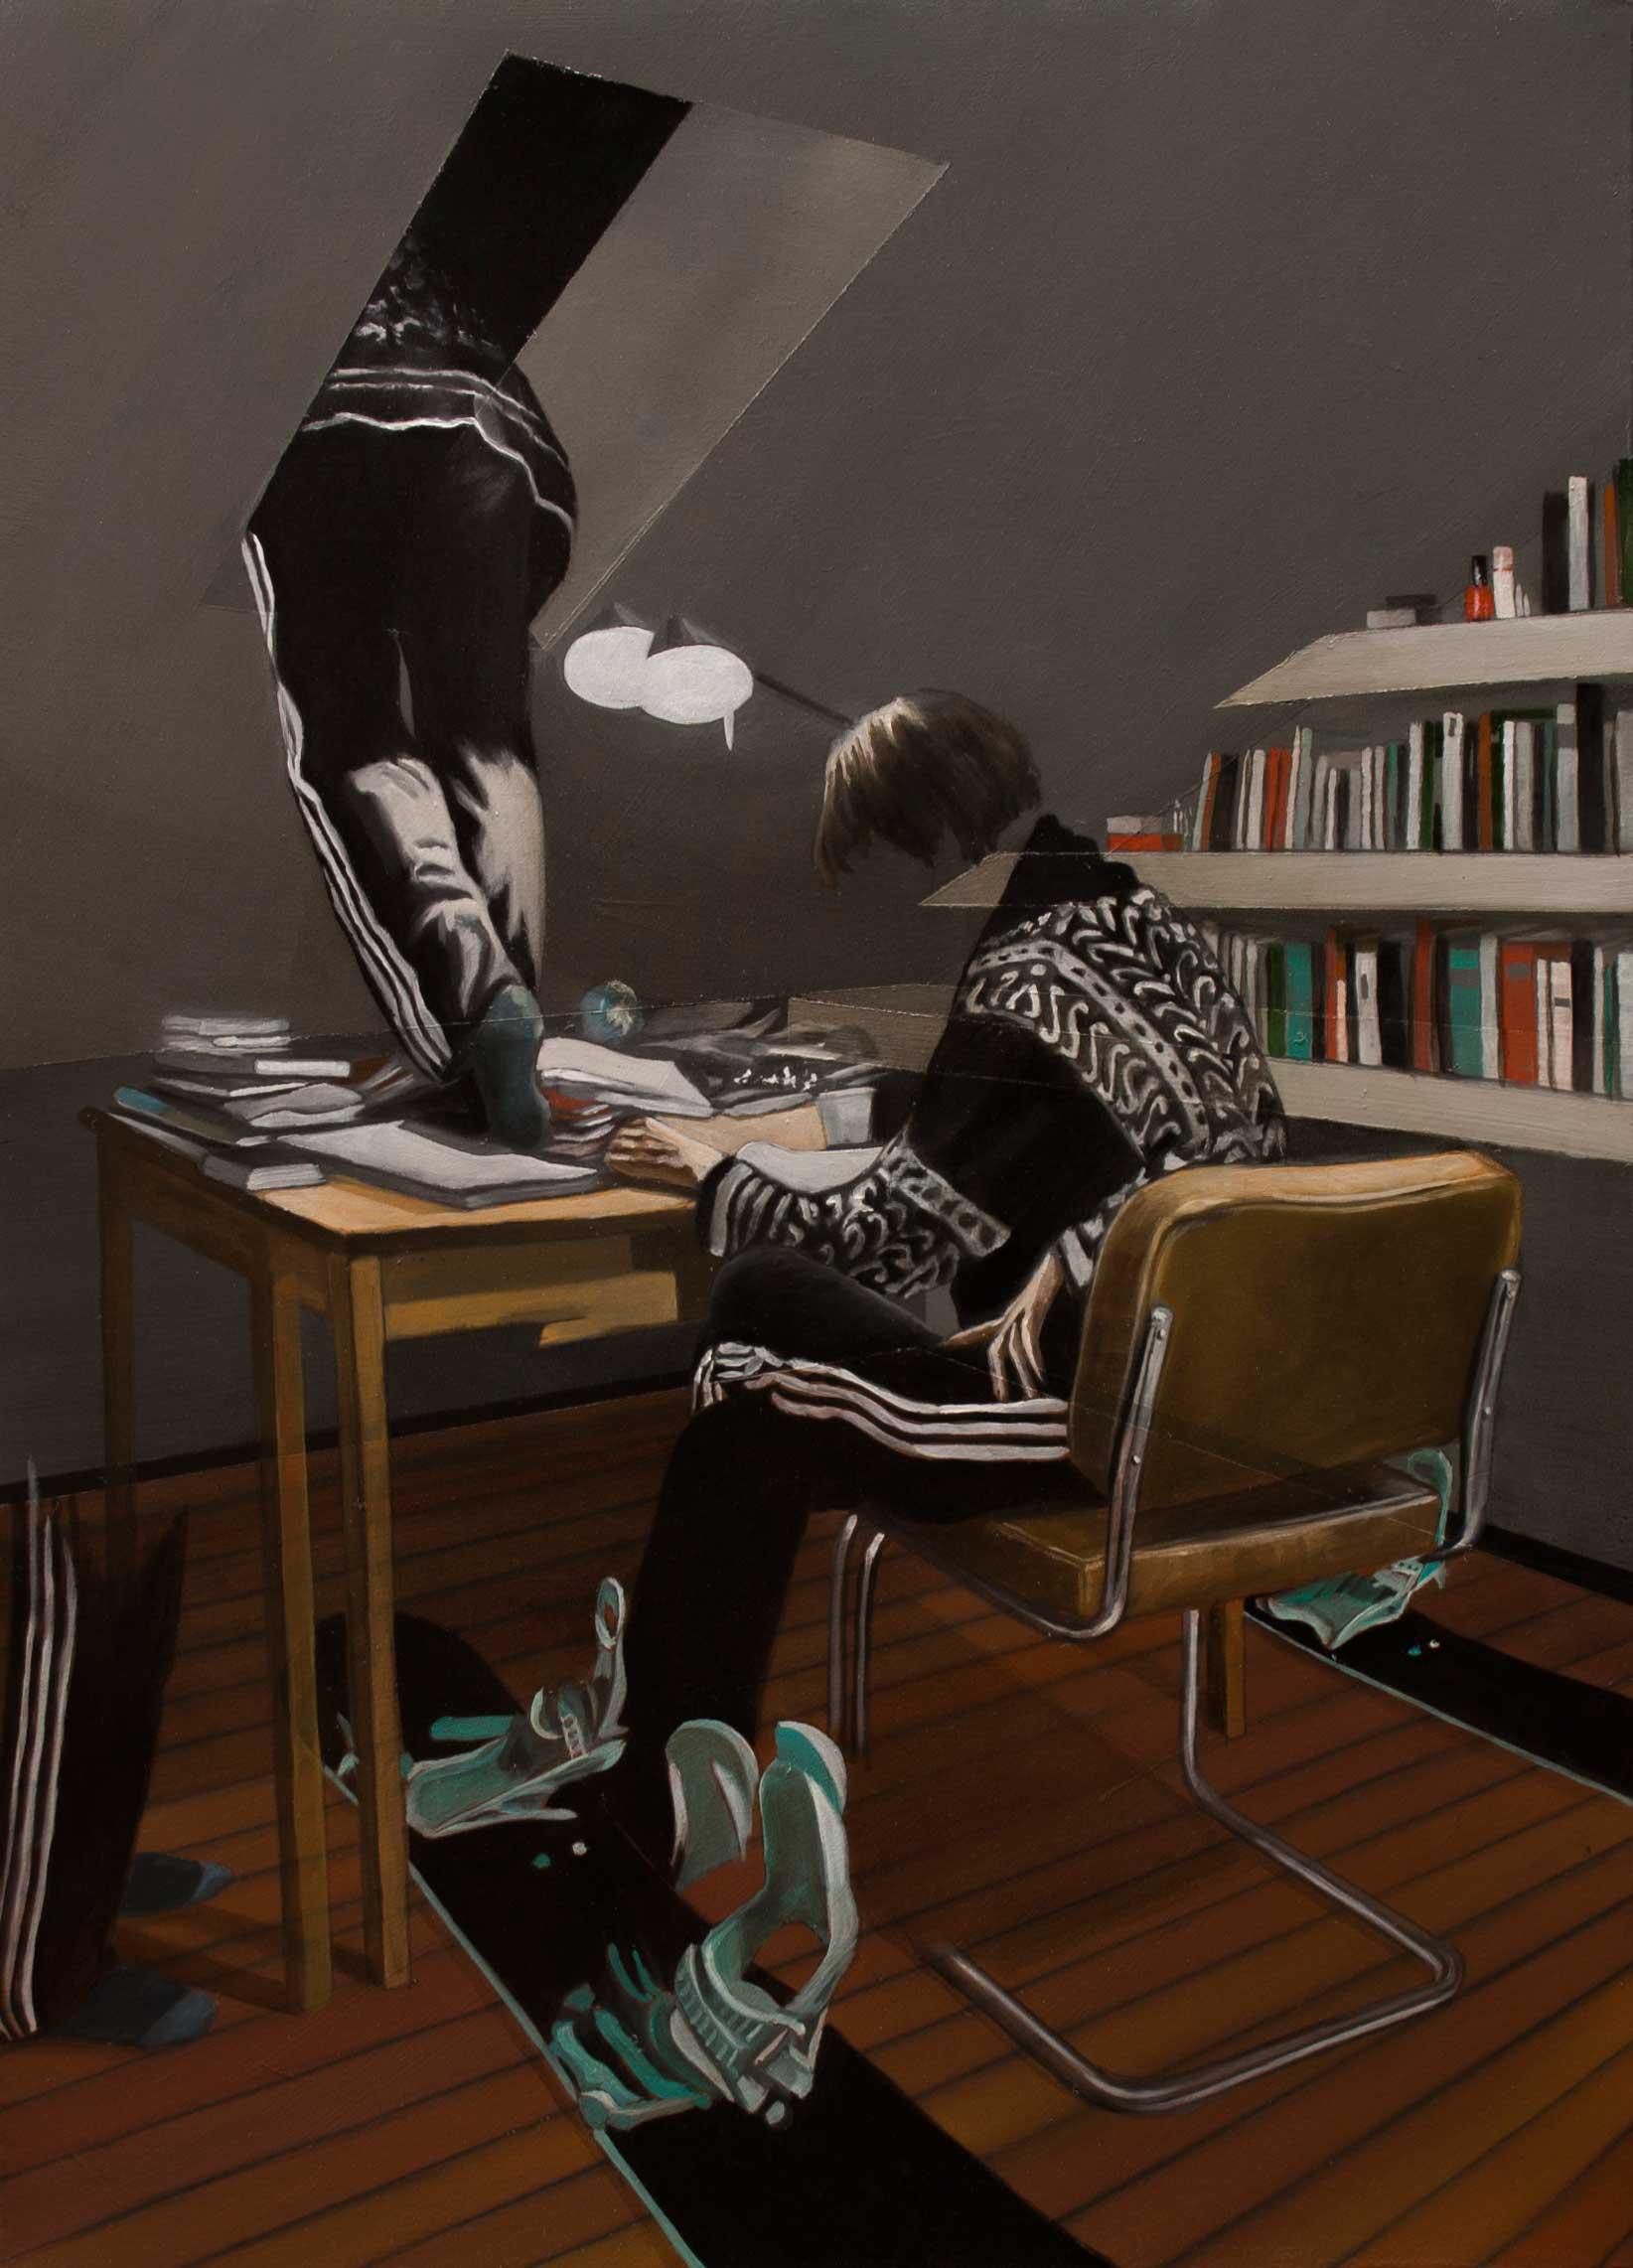 реализм и сюрреализм картины